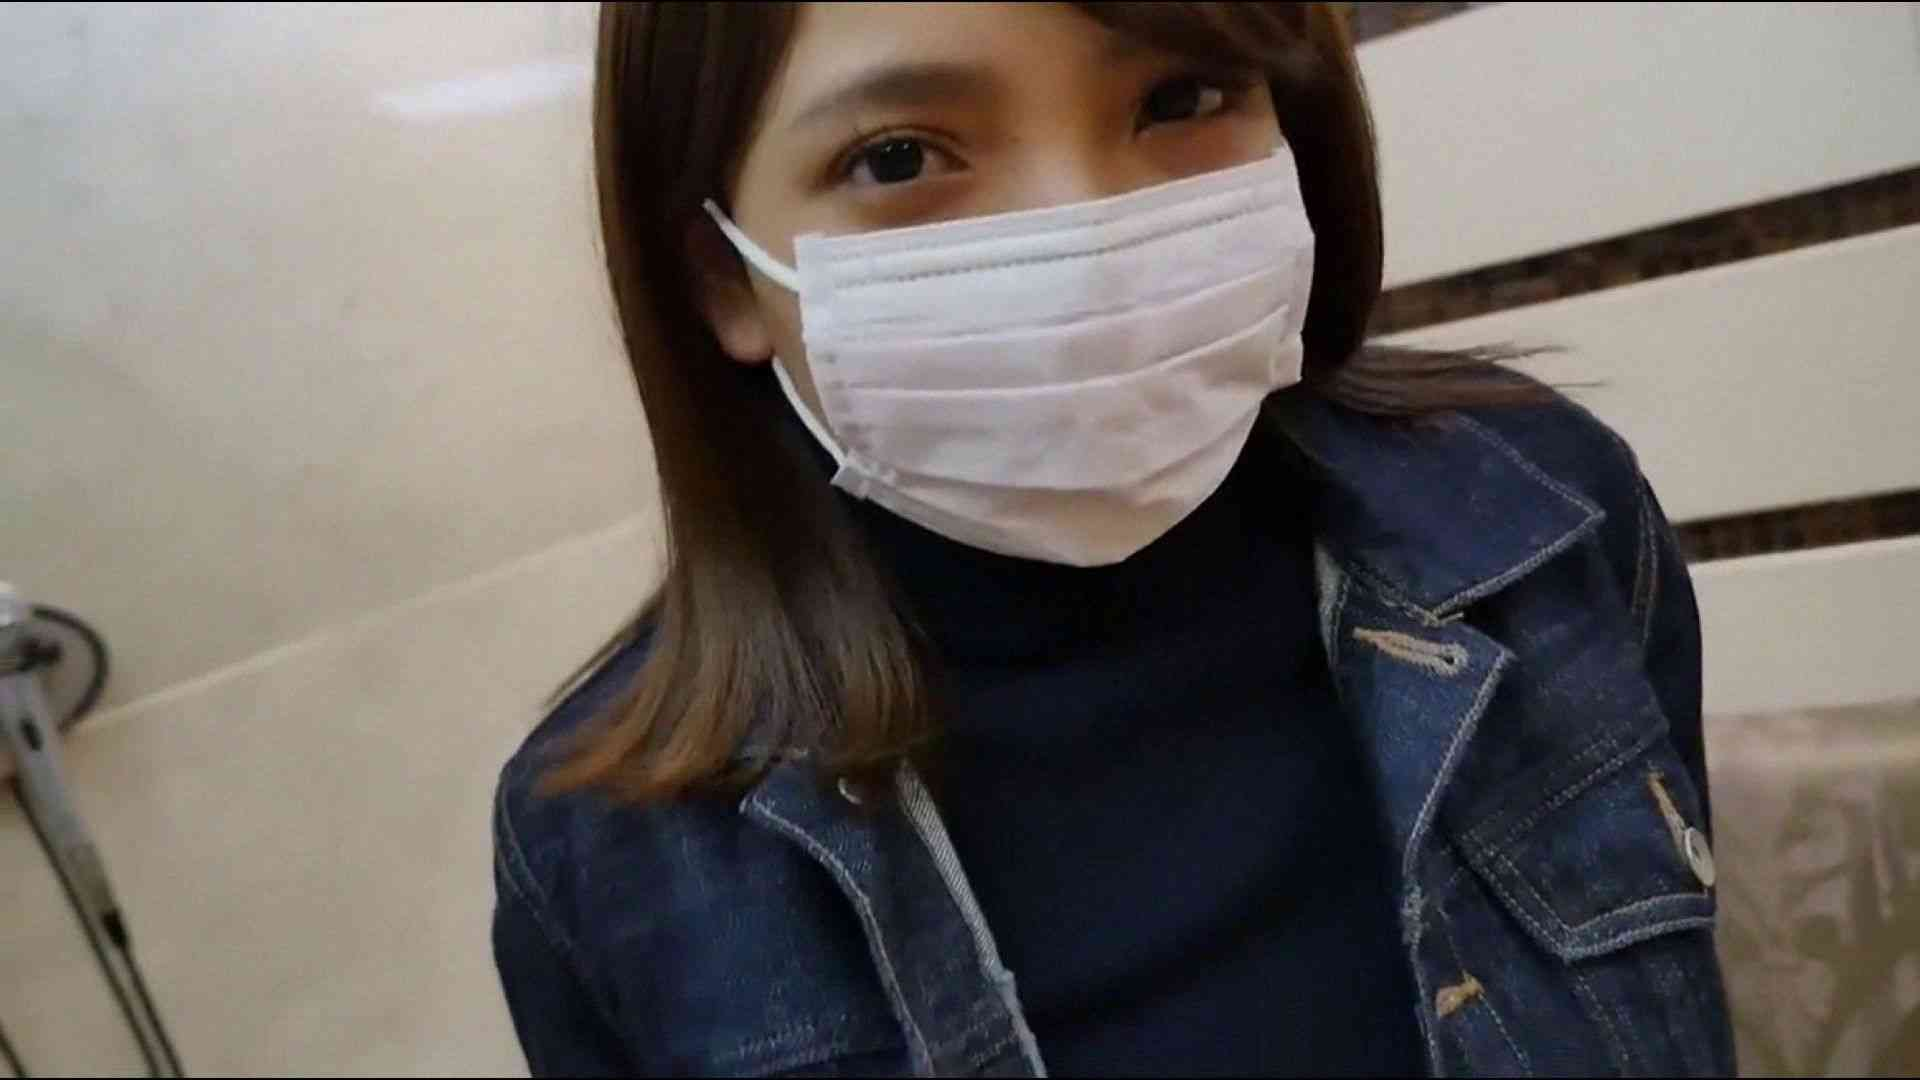 S級厳選美女ビッチガールVol.41 前編 美女  83pic 16